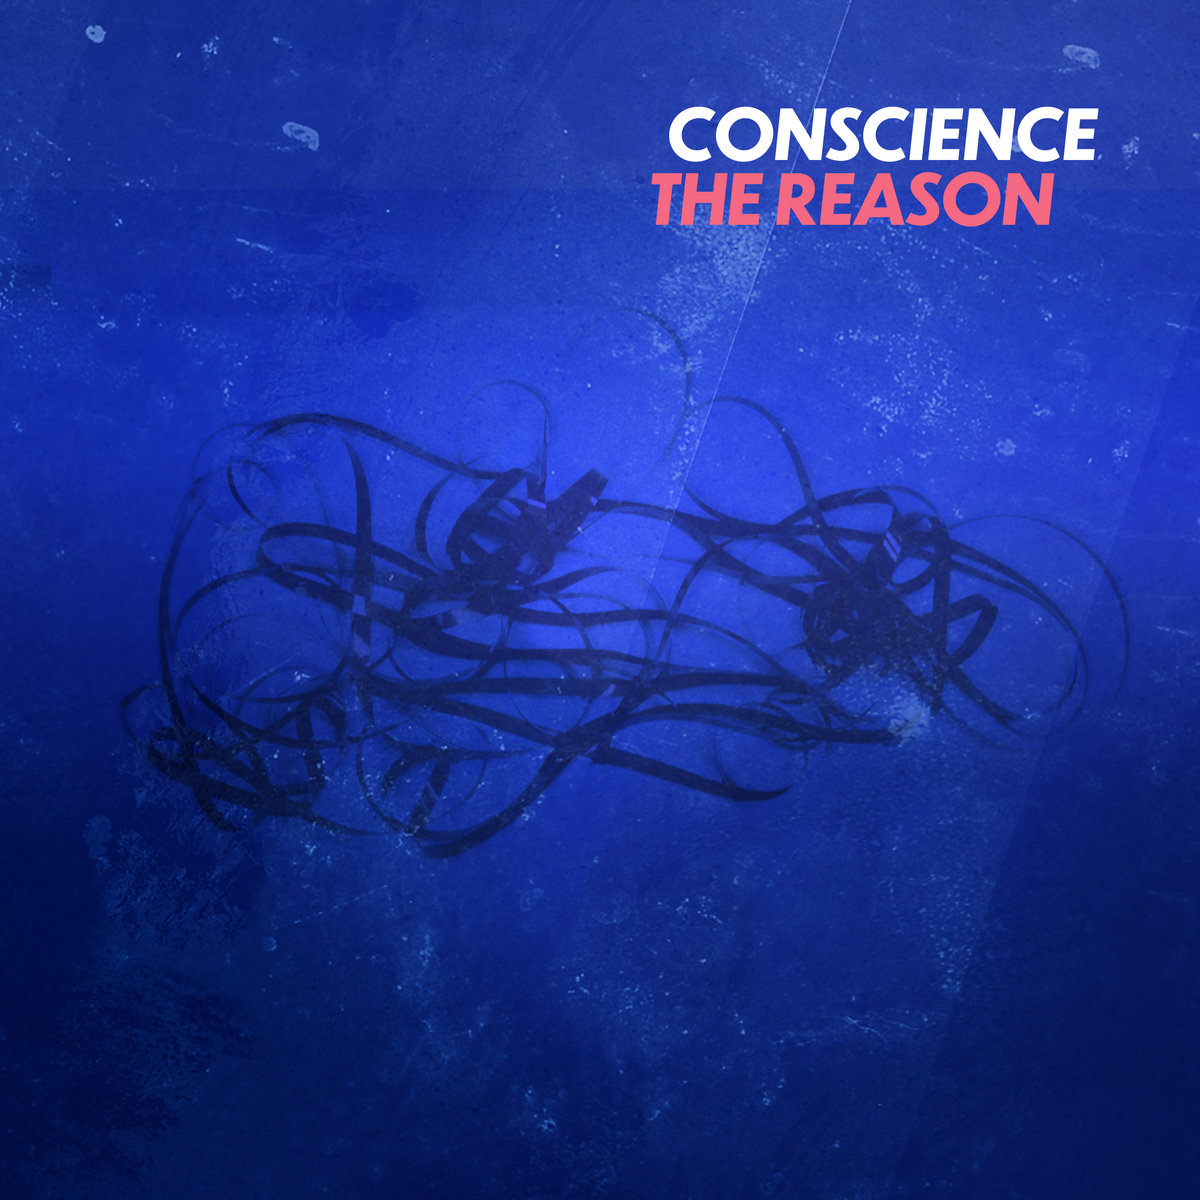 Conscience - The Reason - Conscience - The reason